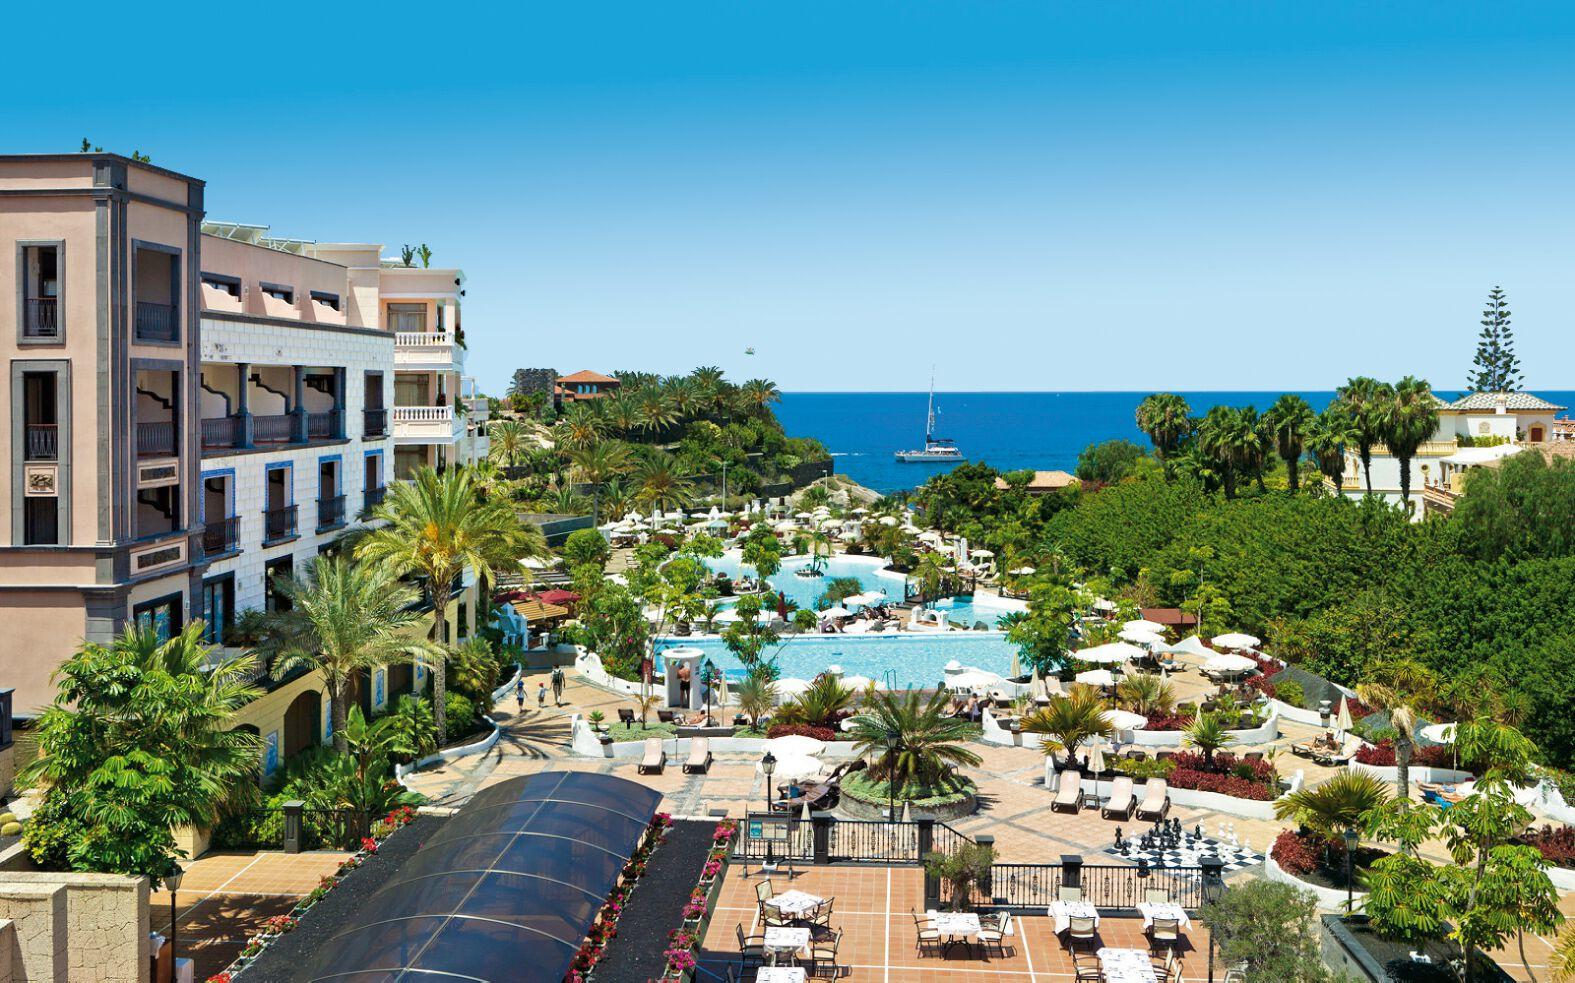 Séjour Espagne - Gran Tacande Wellness & Relax Costa Adeje - 5*